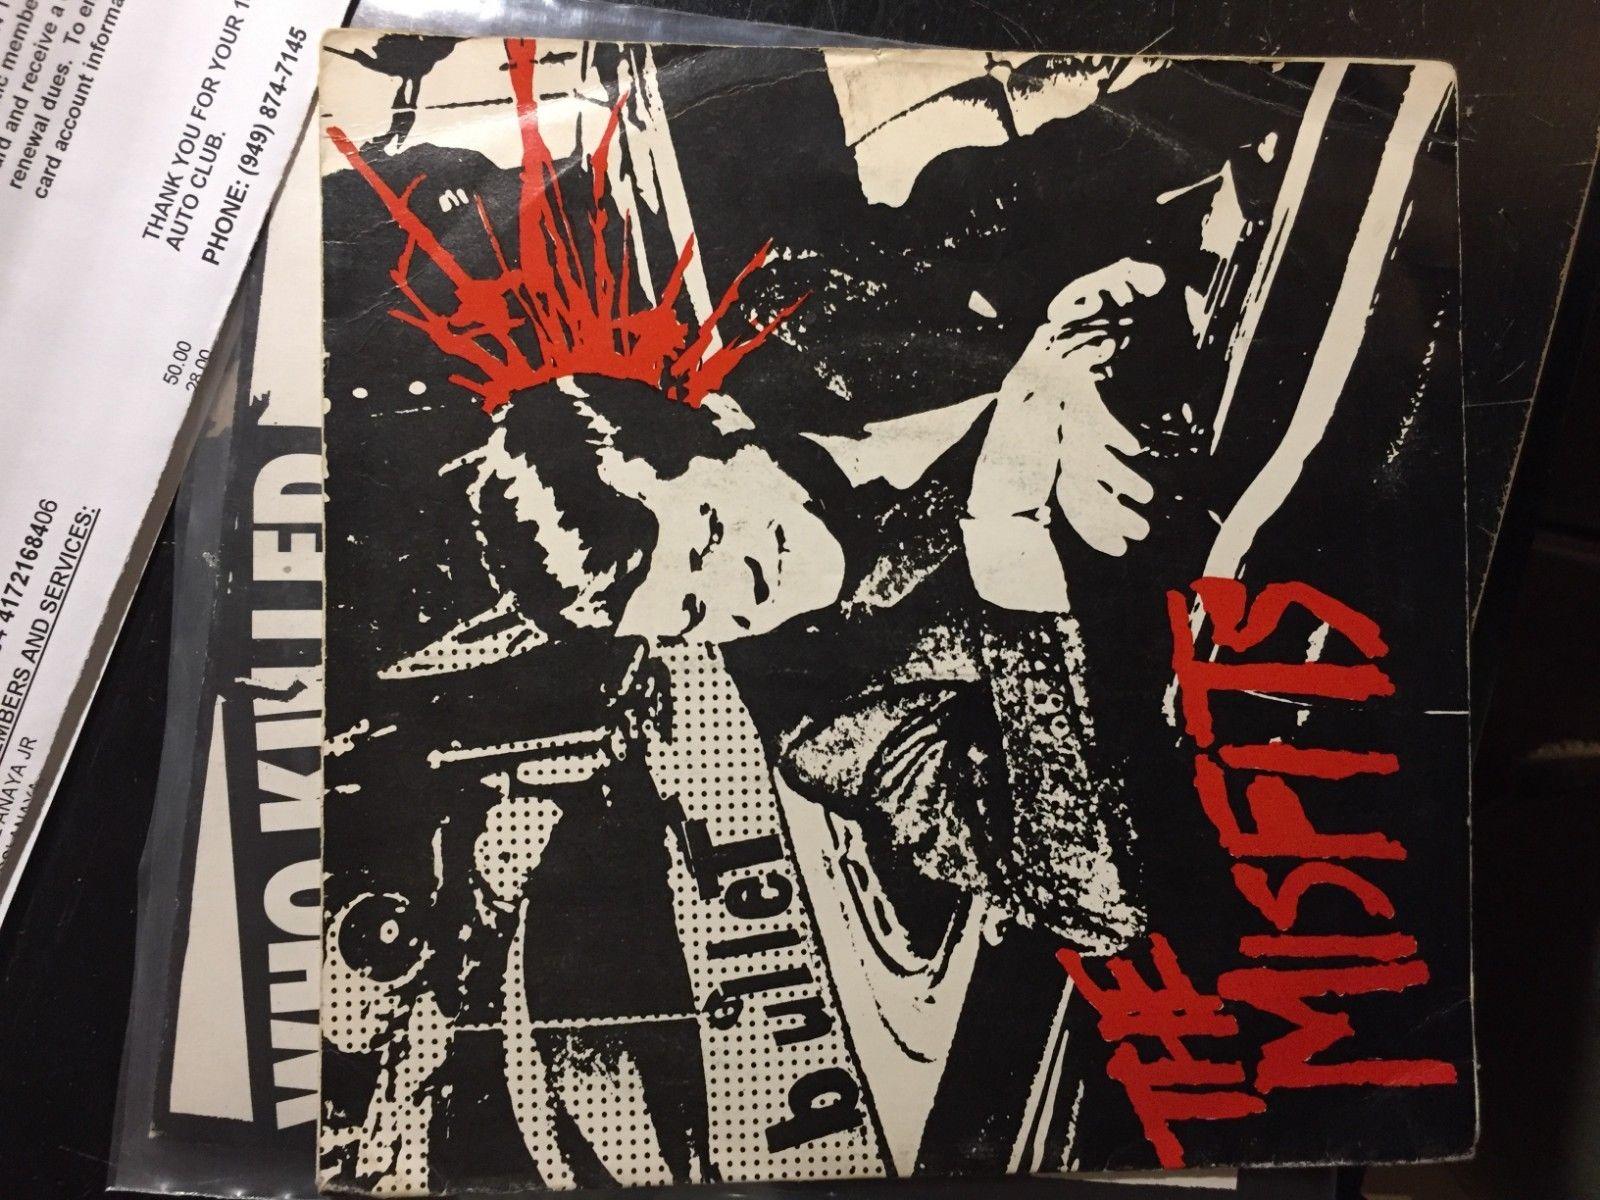 Misfits, Bullet, KBD, Punk, Danzig.